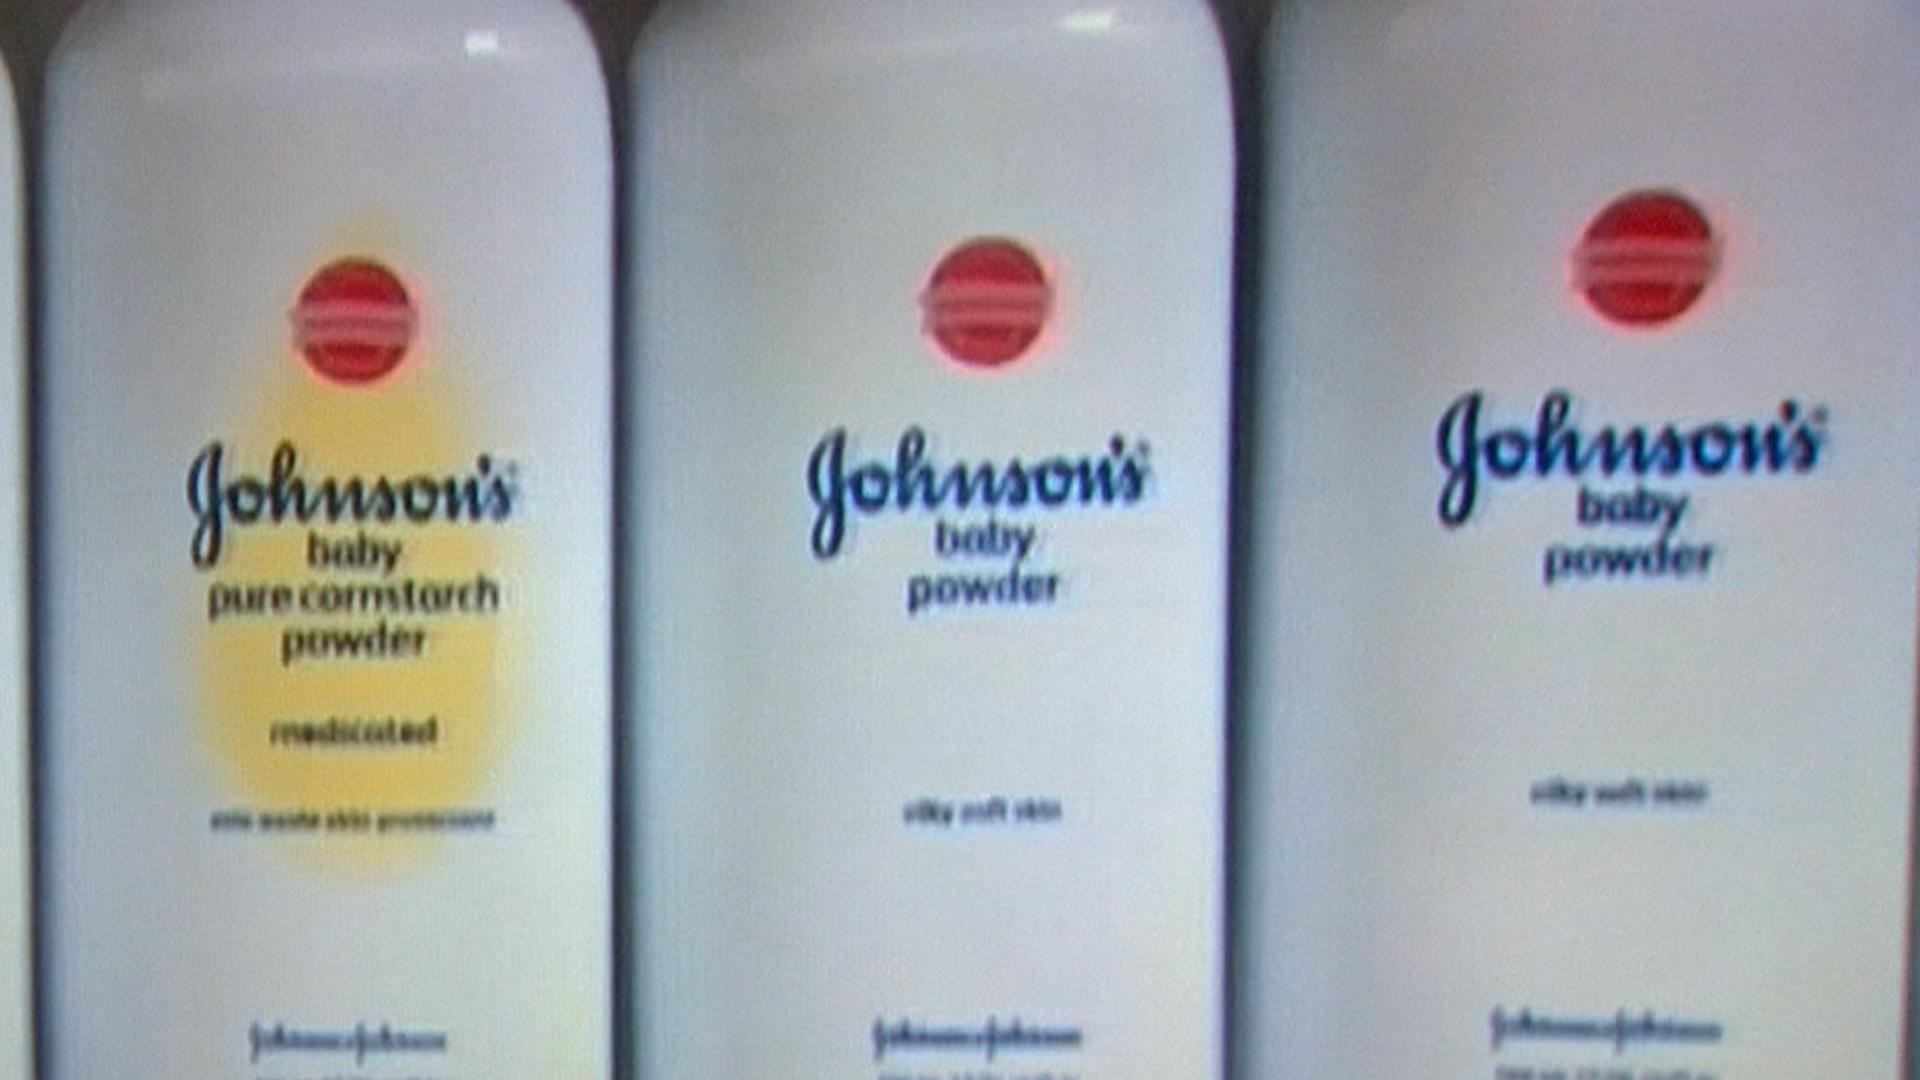 Johnson Amp Johnson Case Can Talcum Powder Really Cause Cancer